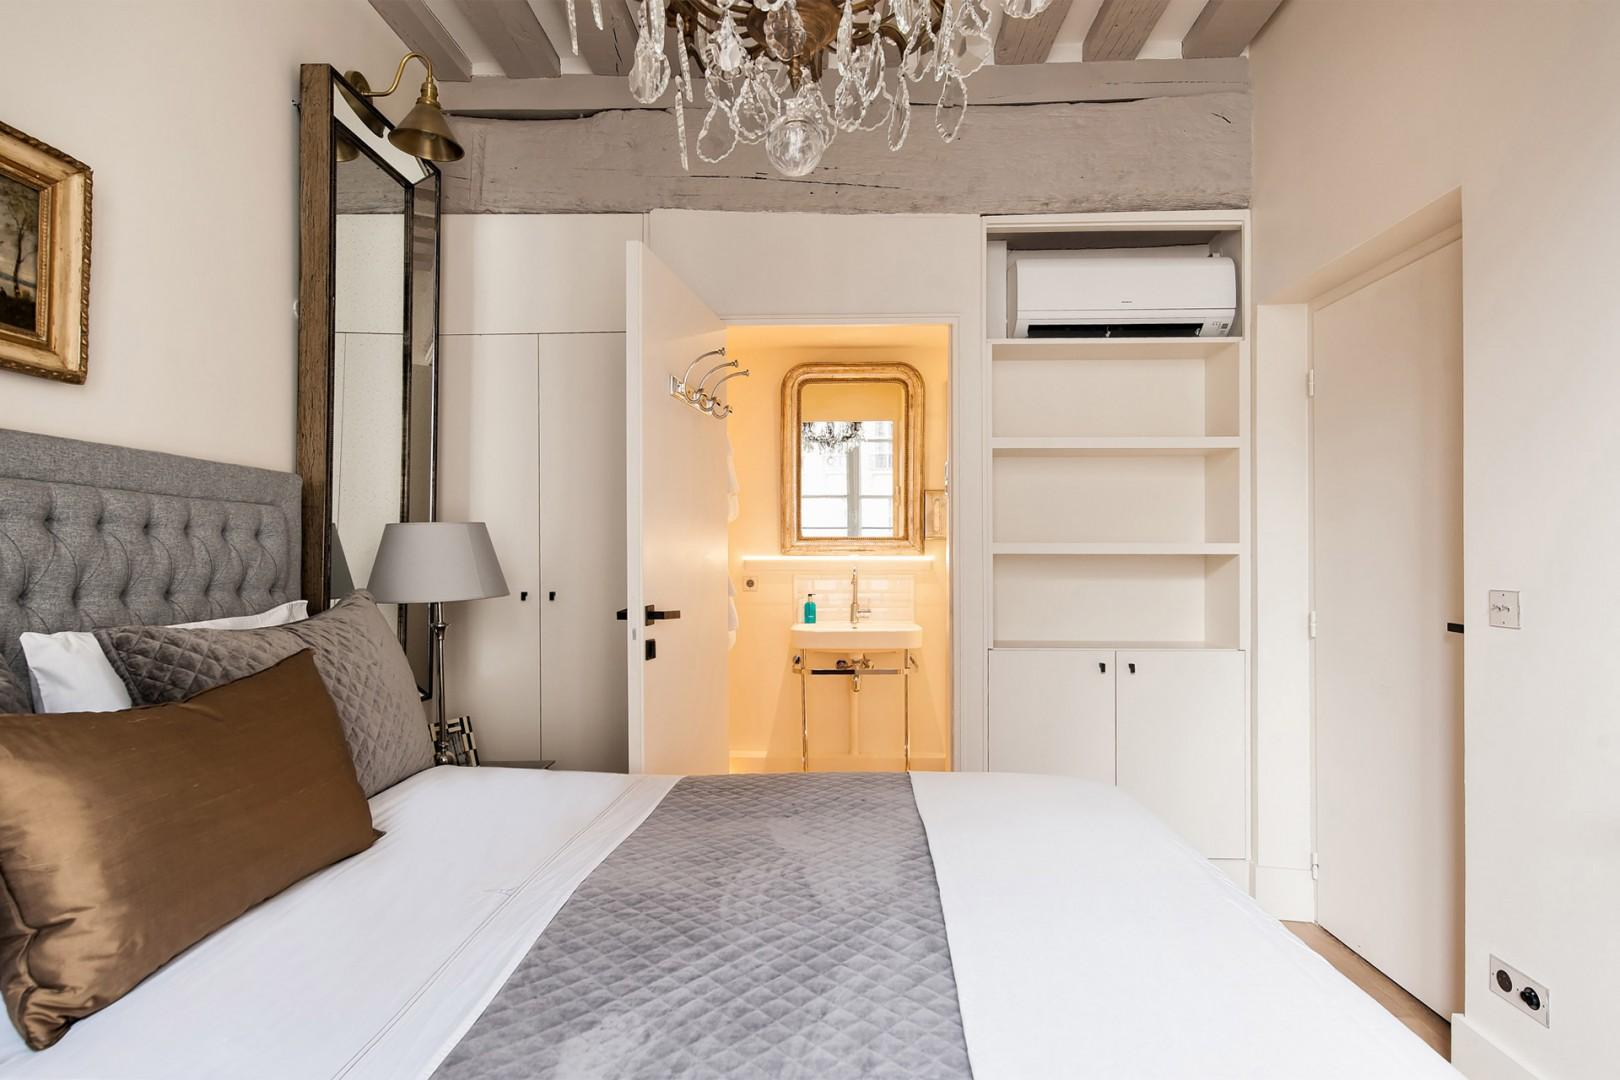 The bedroom has an en suite bathroom and ample storage.